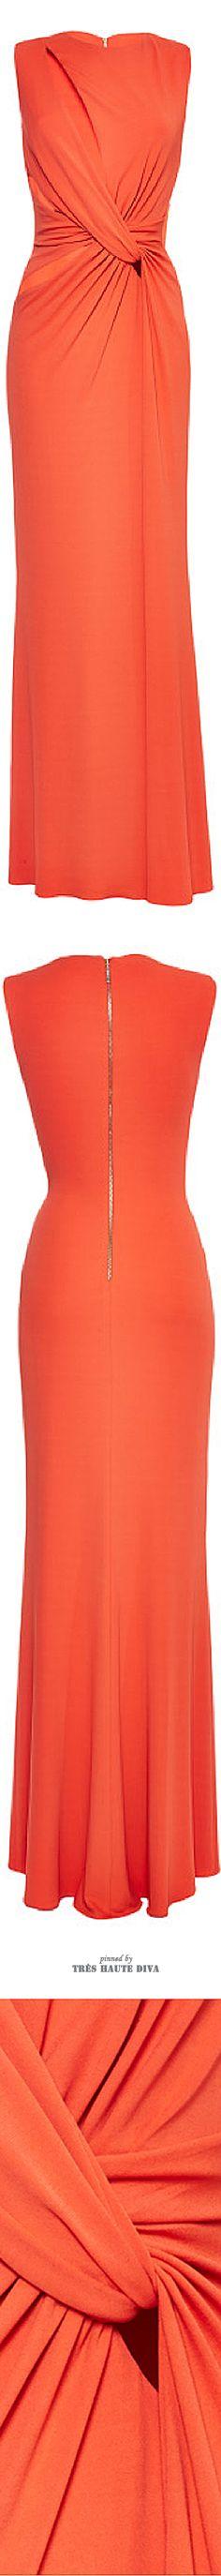 Elie Saab Orange Jersey Twisted Knot Dress ♔ SS 2015